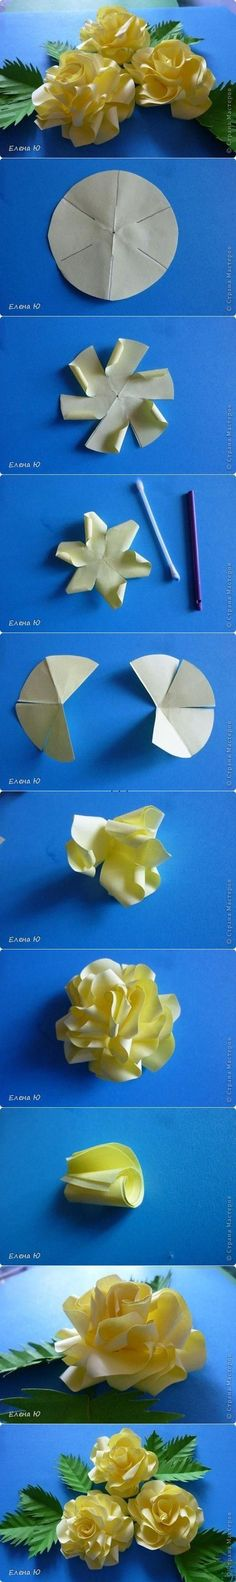 DIY-paper-rose-tutorial – diypictures.net